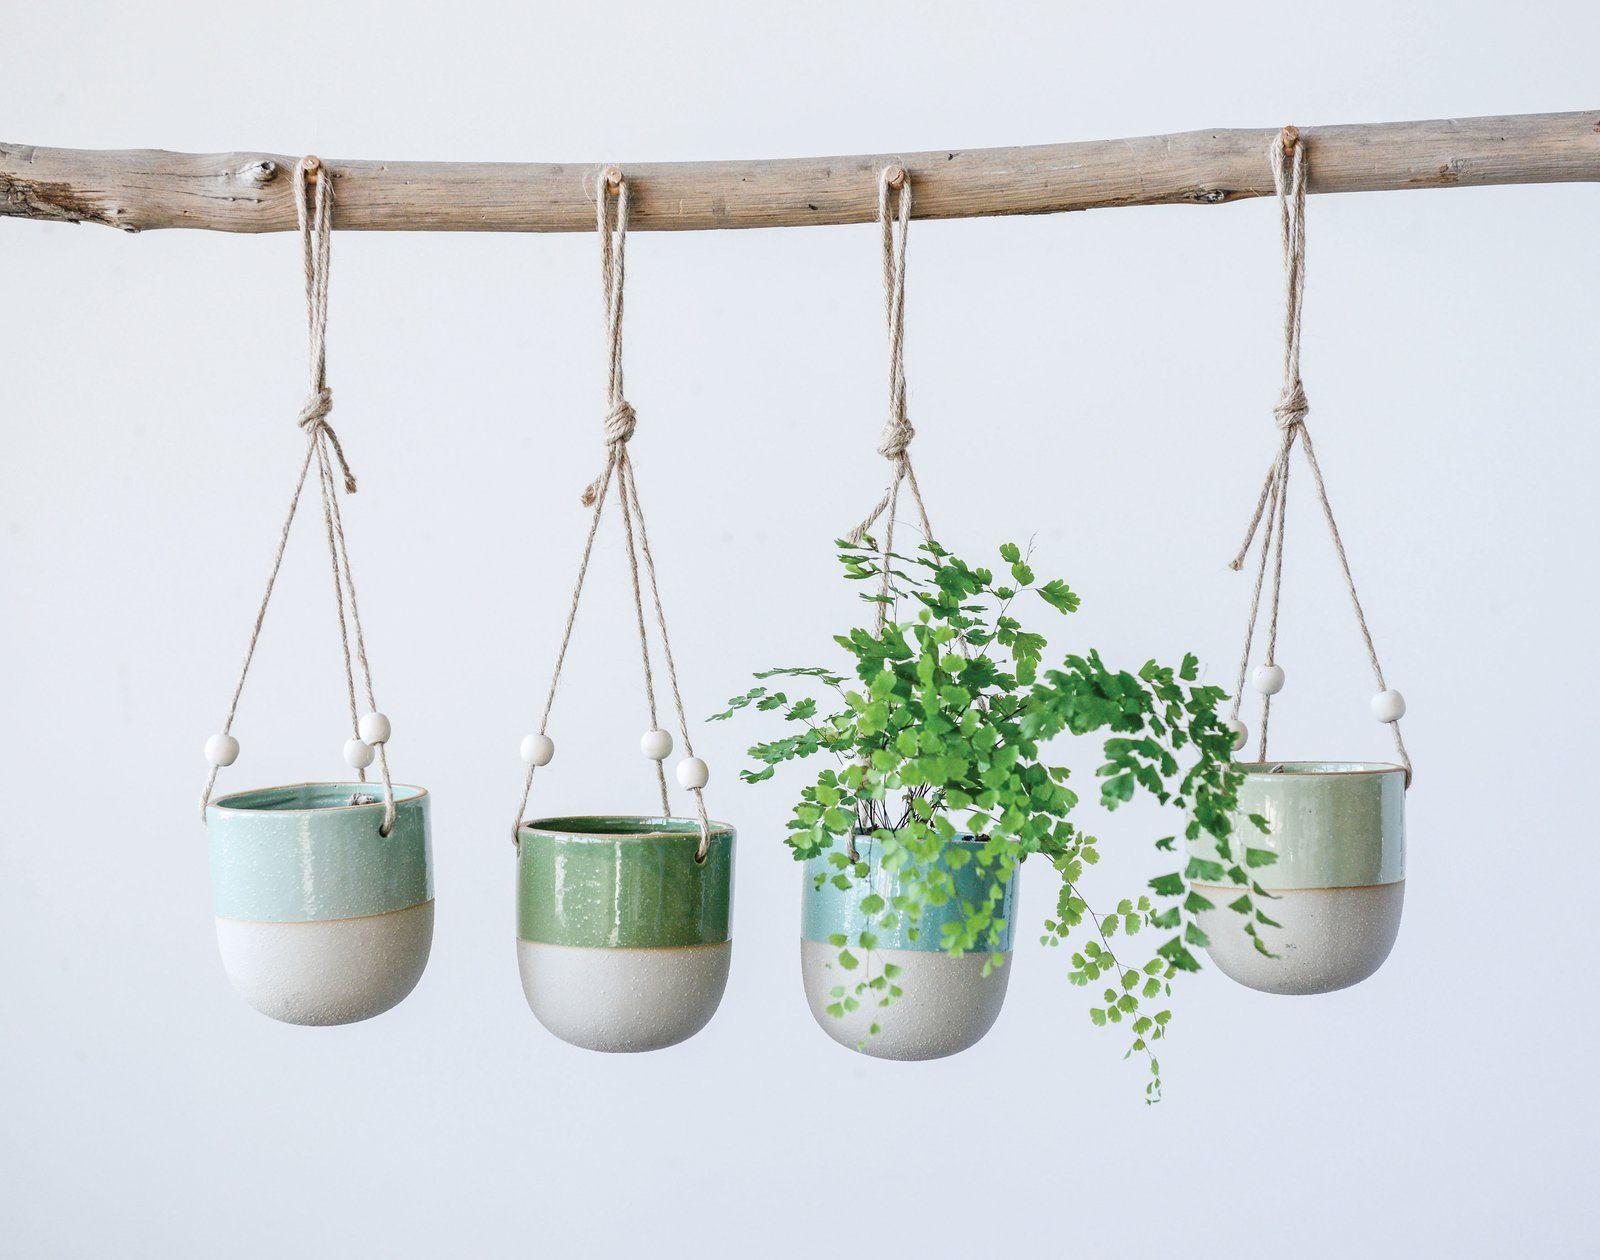 Kannon Matte Glaze Stoneware Hanging Planter Hanging Planters Hanging Plants Indoor Hanging Plants